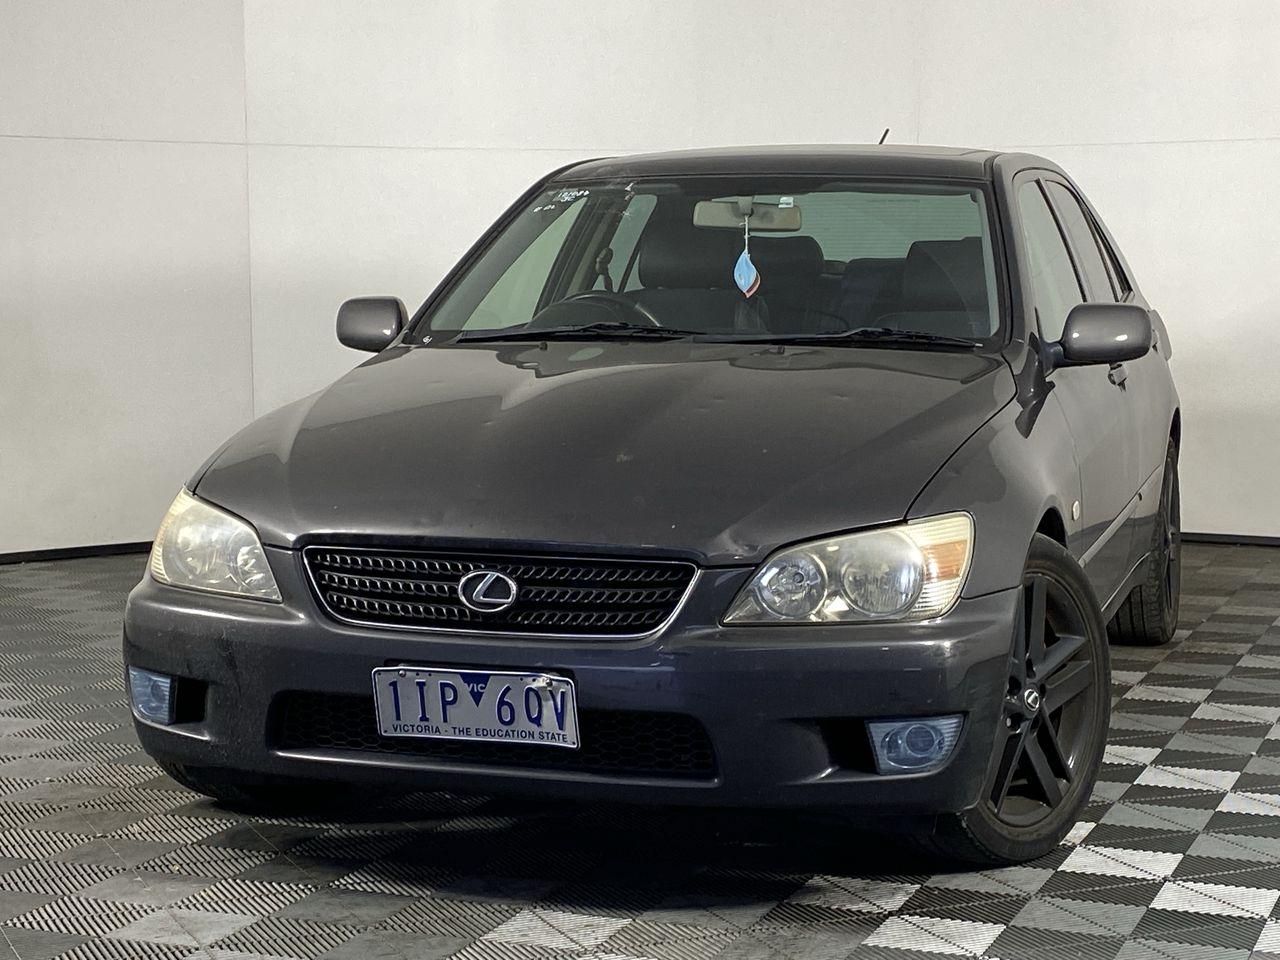 2002 Lexus IS200 Sports Luxury Automatic Sedan